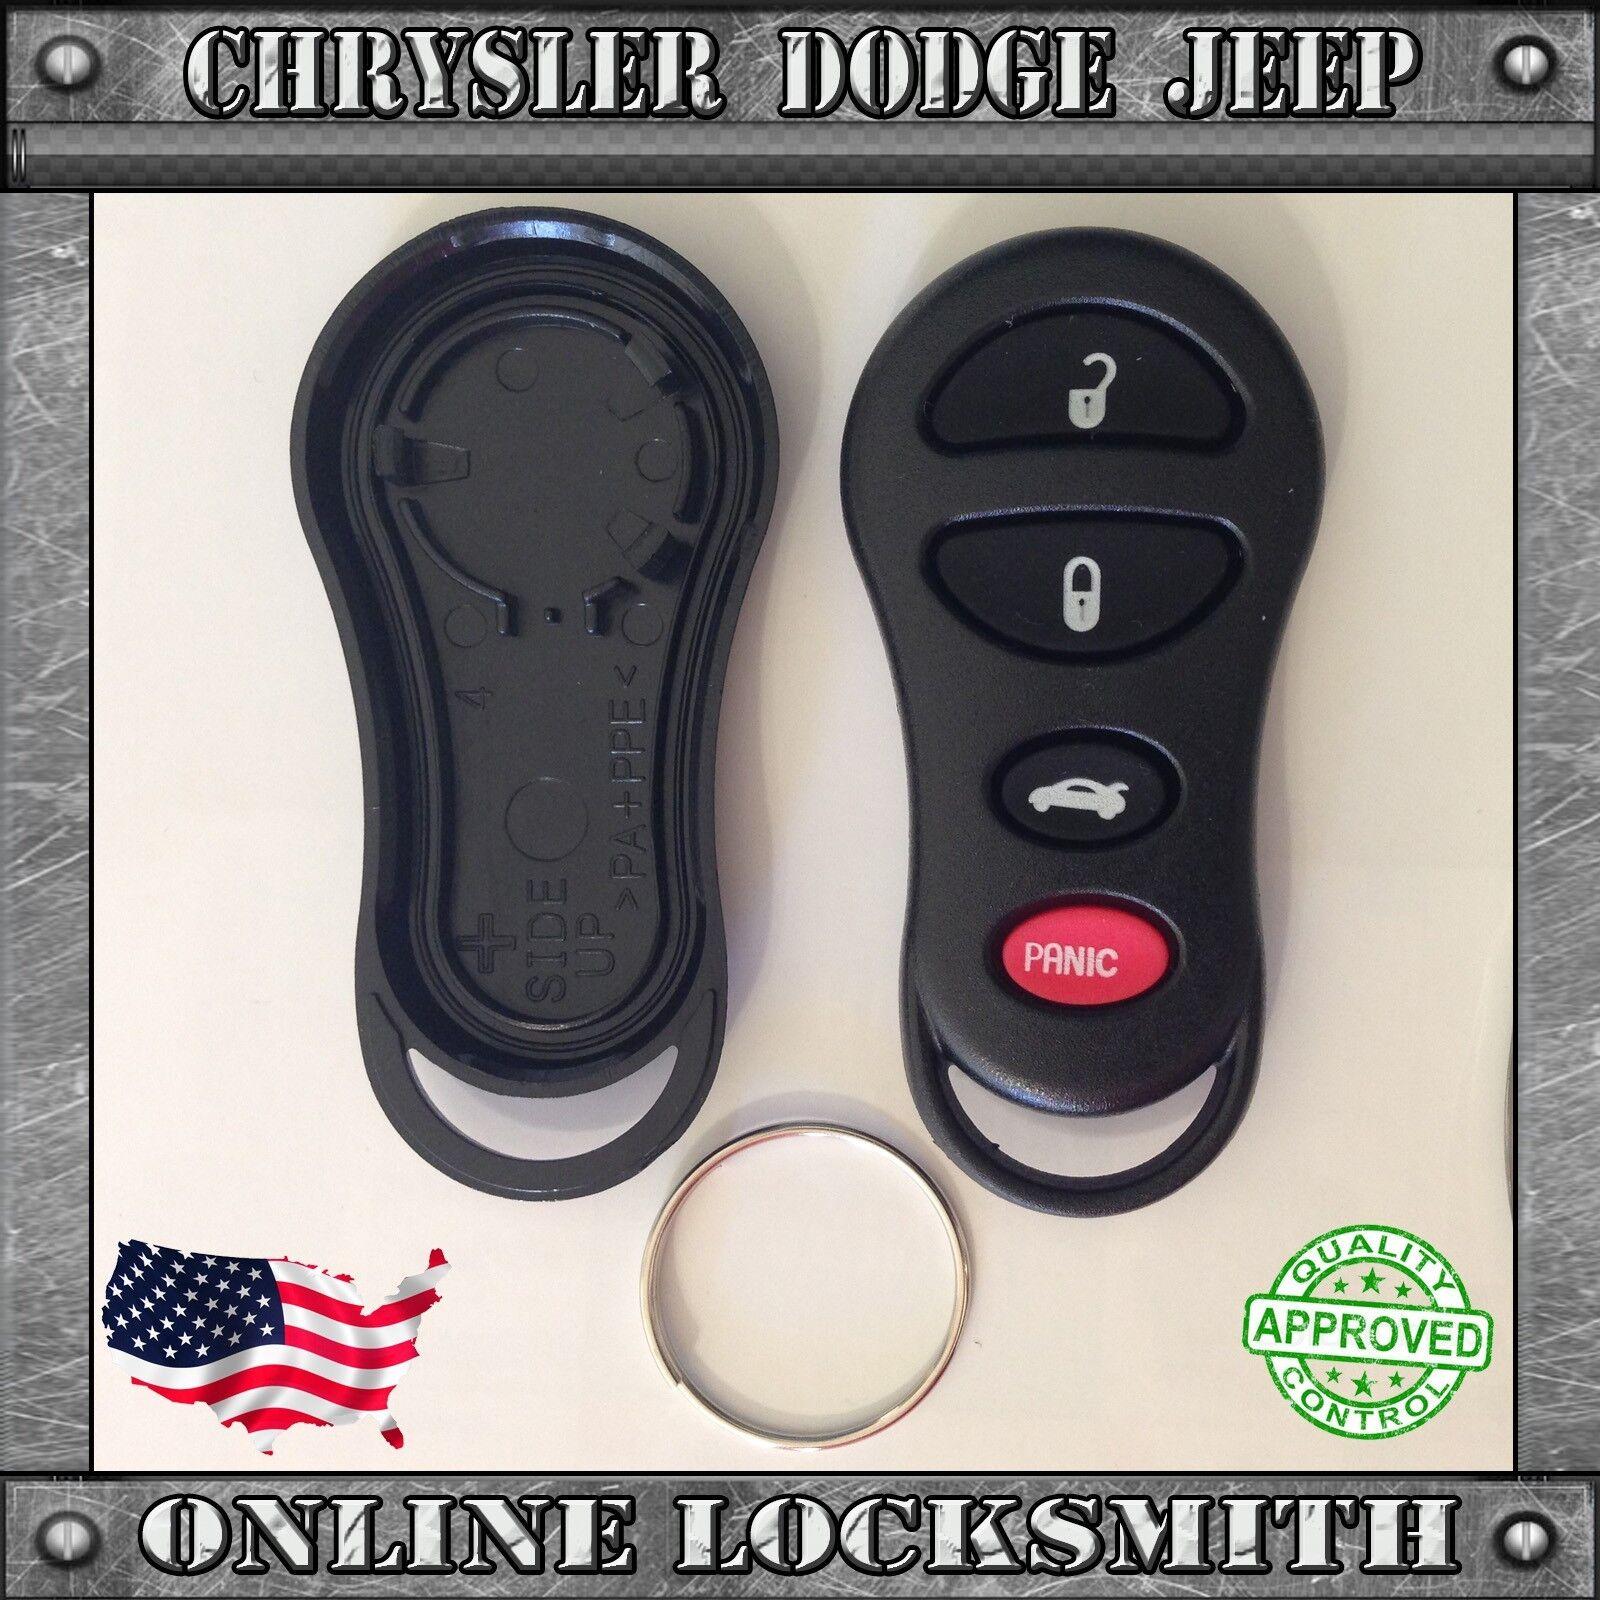 Car Fob Remote Shell Case Pad For 2001 2002 2003 2004 2005 Chrysler PT Cruiser